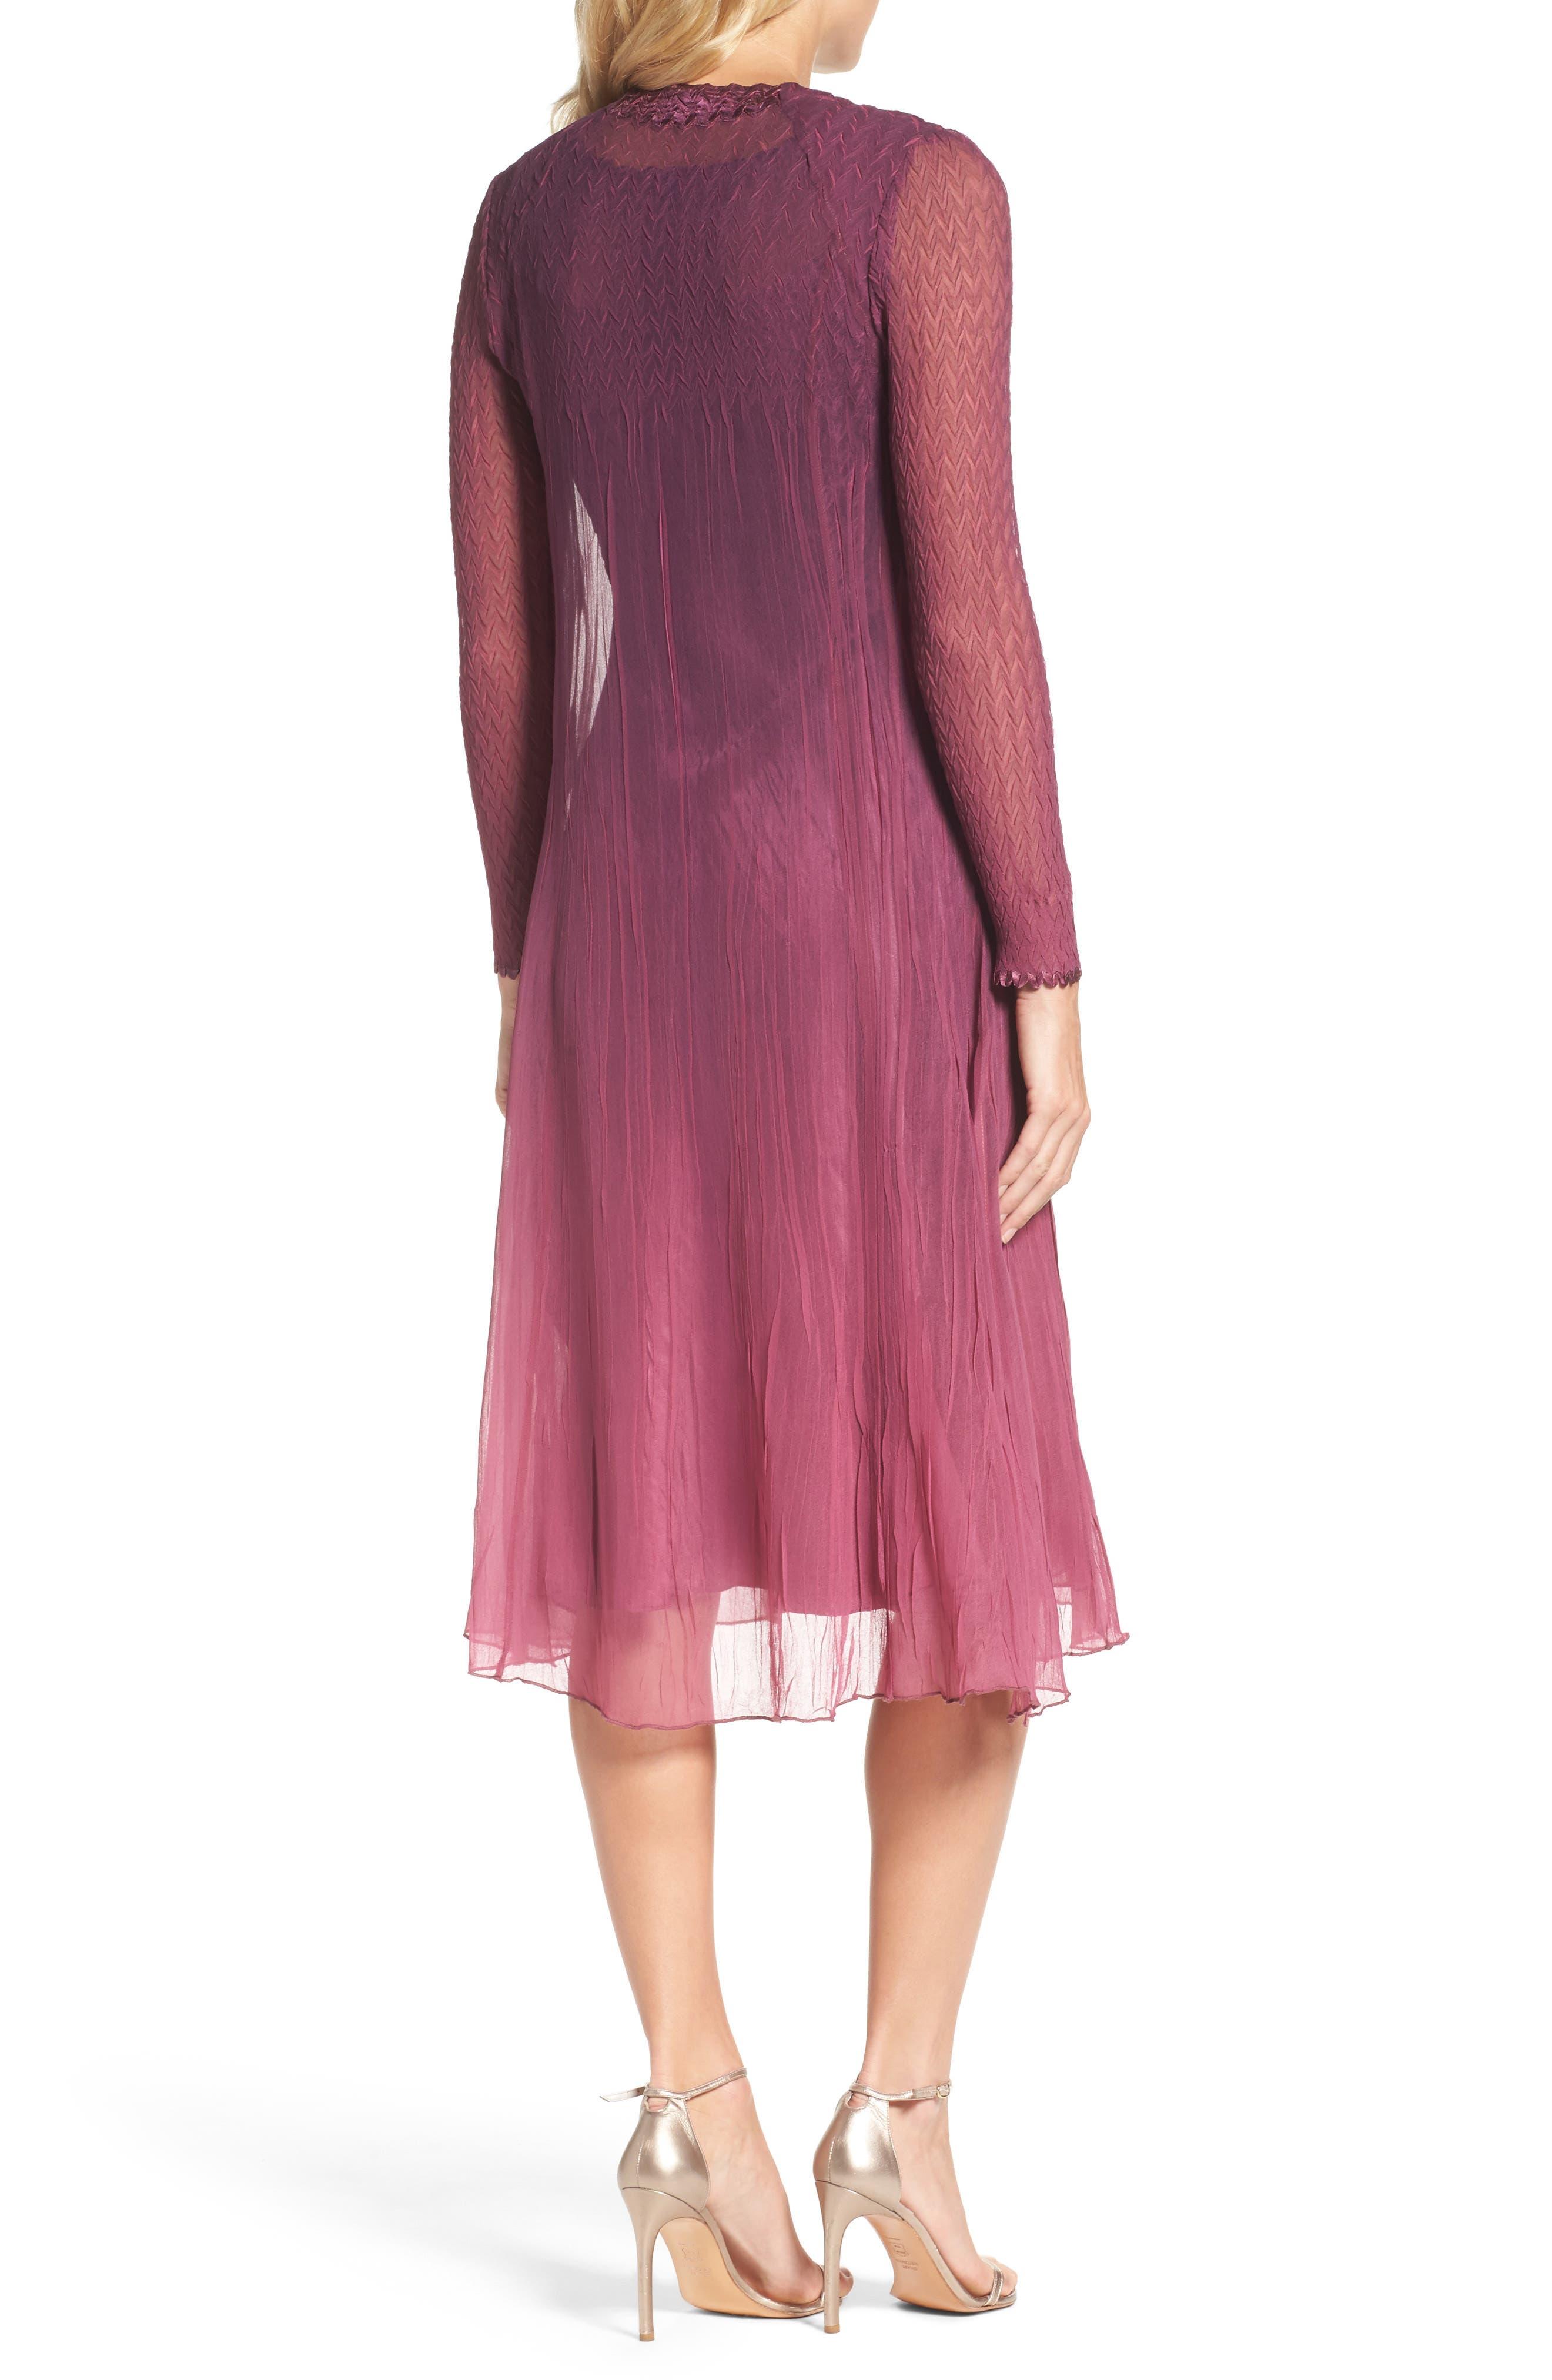 Alternate Image 3  - Komarov Charmeuse & Chiffon A-Line Dress with Jacket (Regular & Petite)